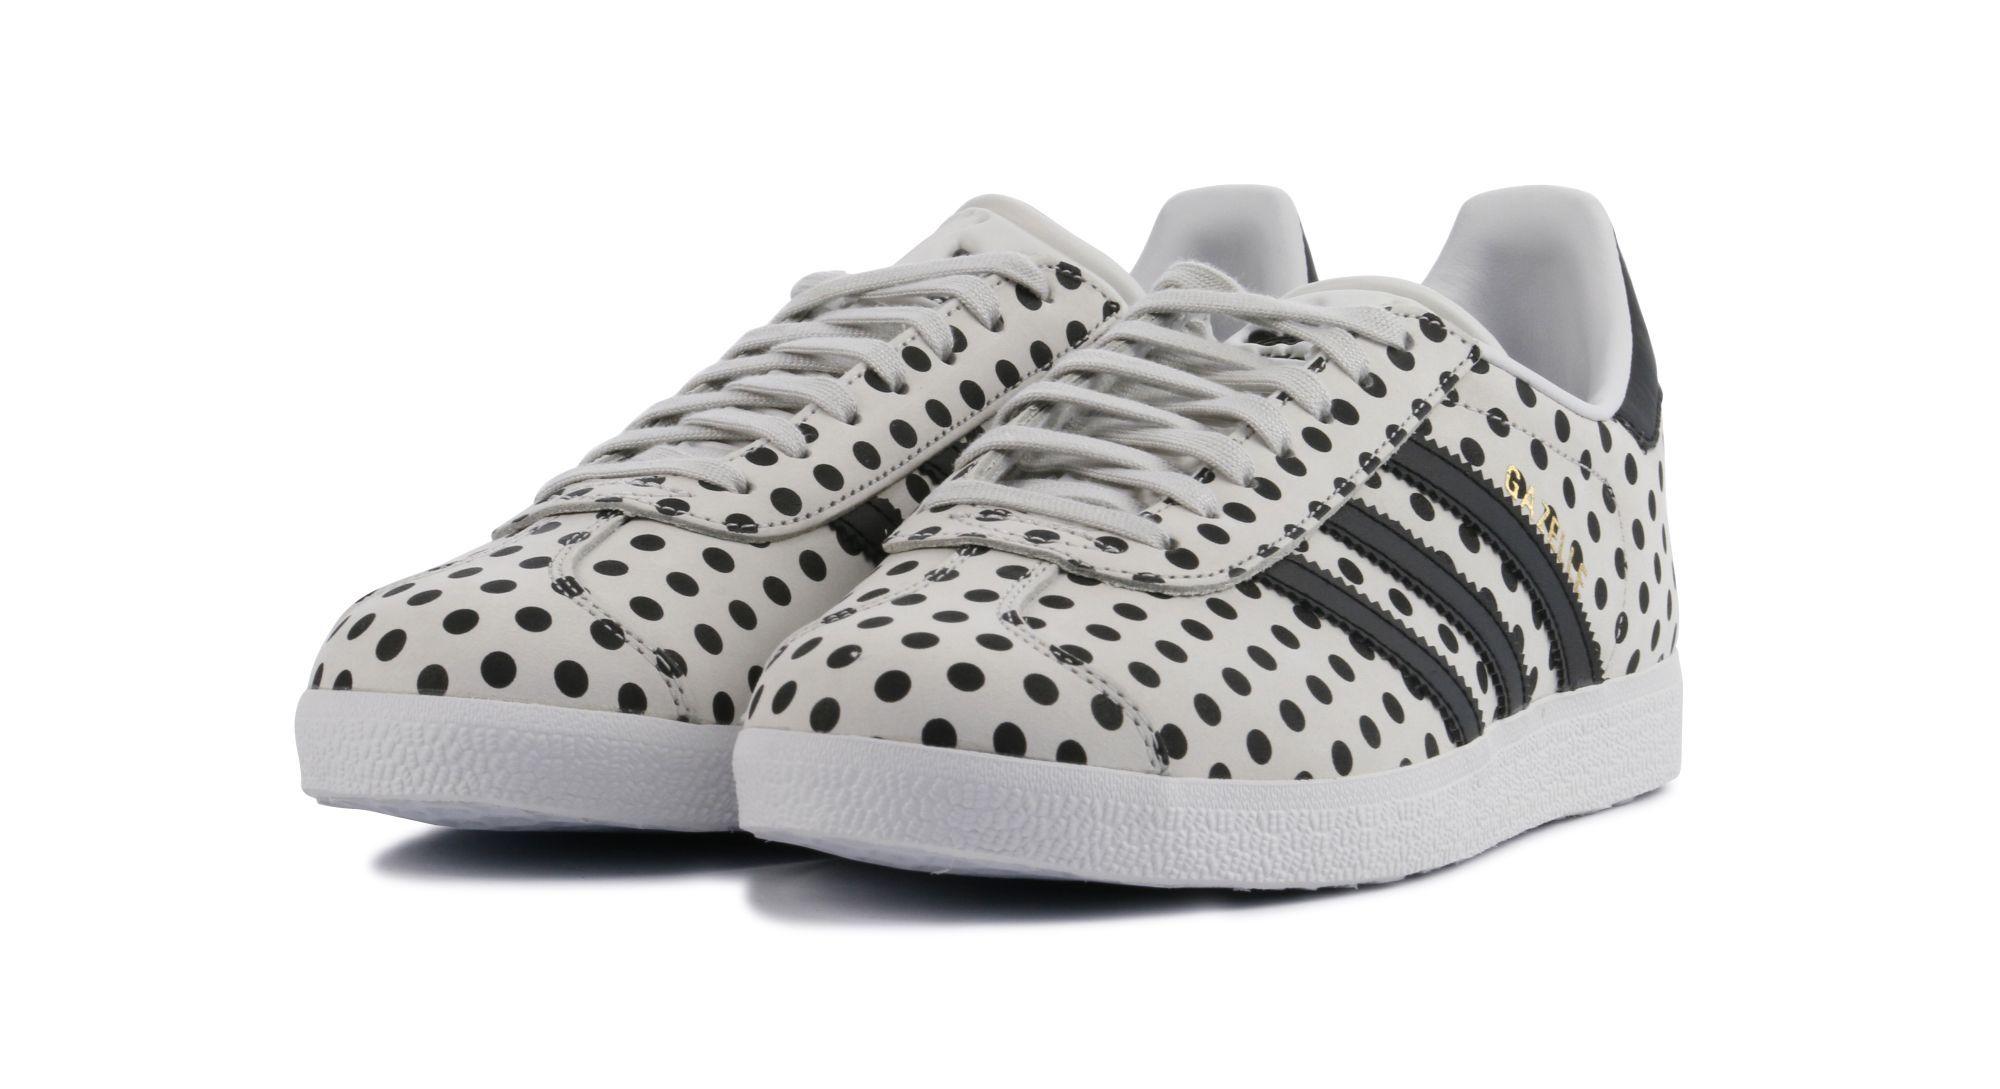 adidas Originals Sneakers | Gazelle W | Adidas originals ...